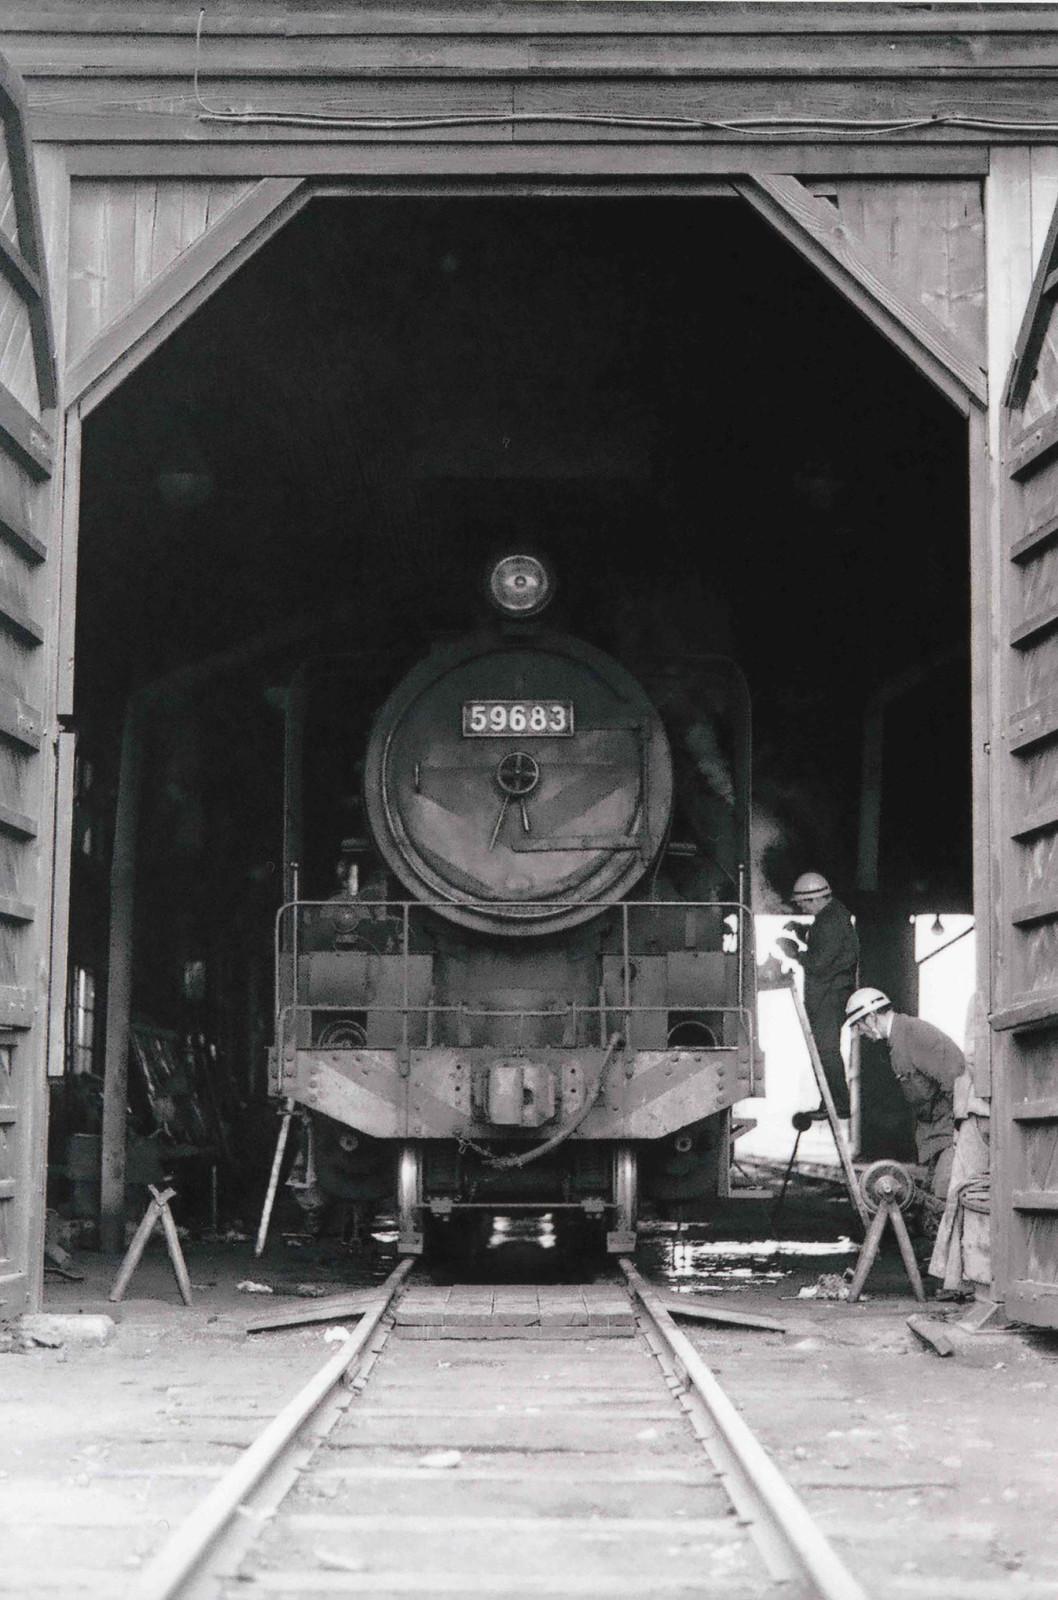 19728006